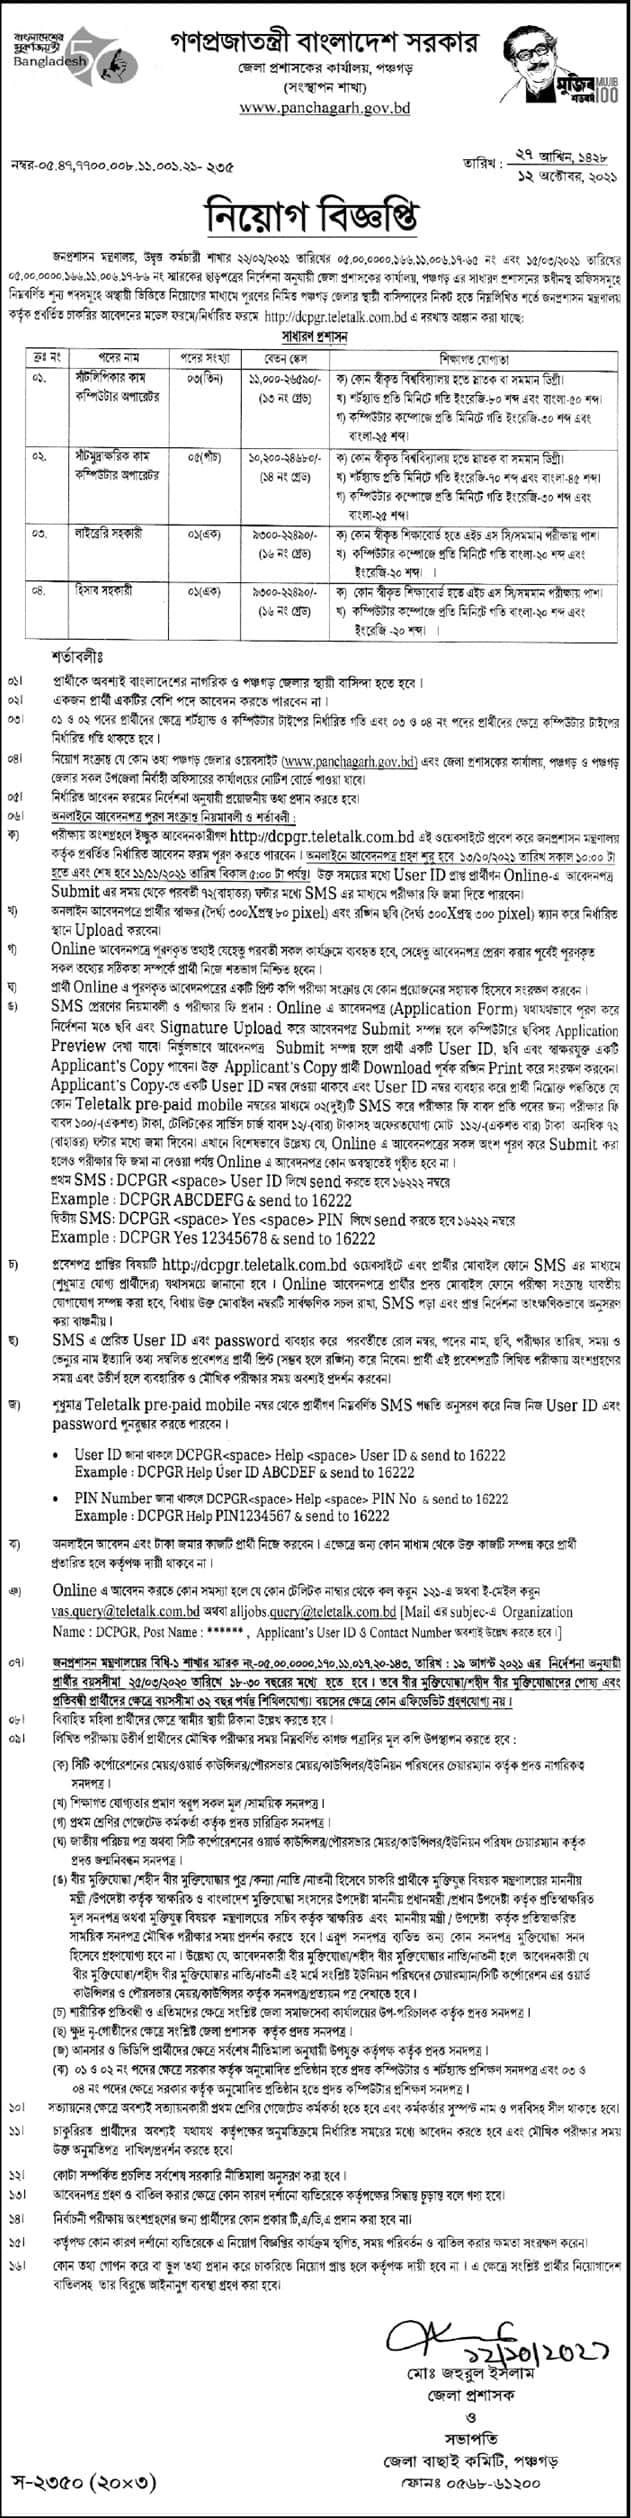 Panchagarh DC Office Job Circular 2021